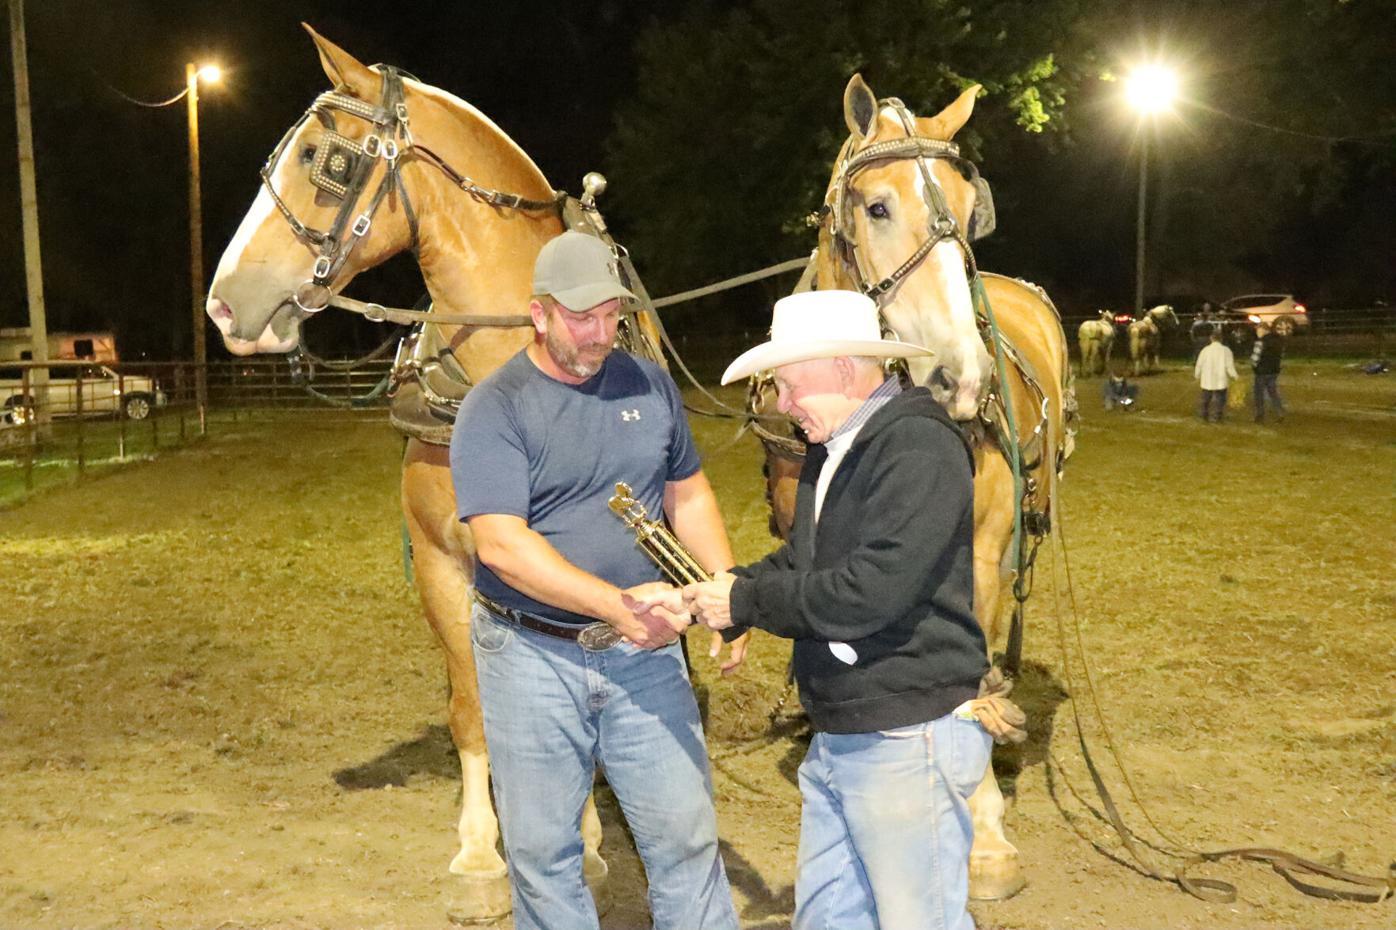 9-24-20 Pickering Horse Show 9.jpg